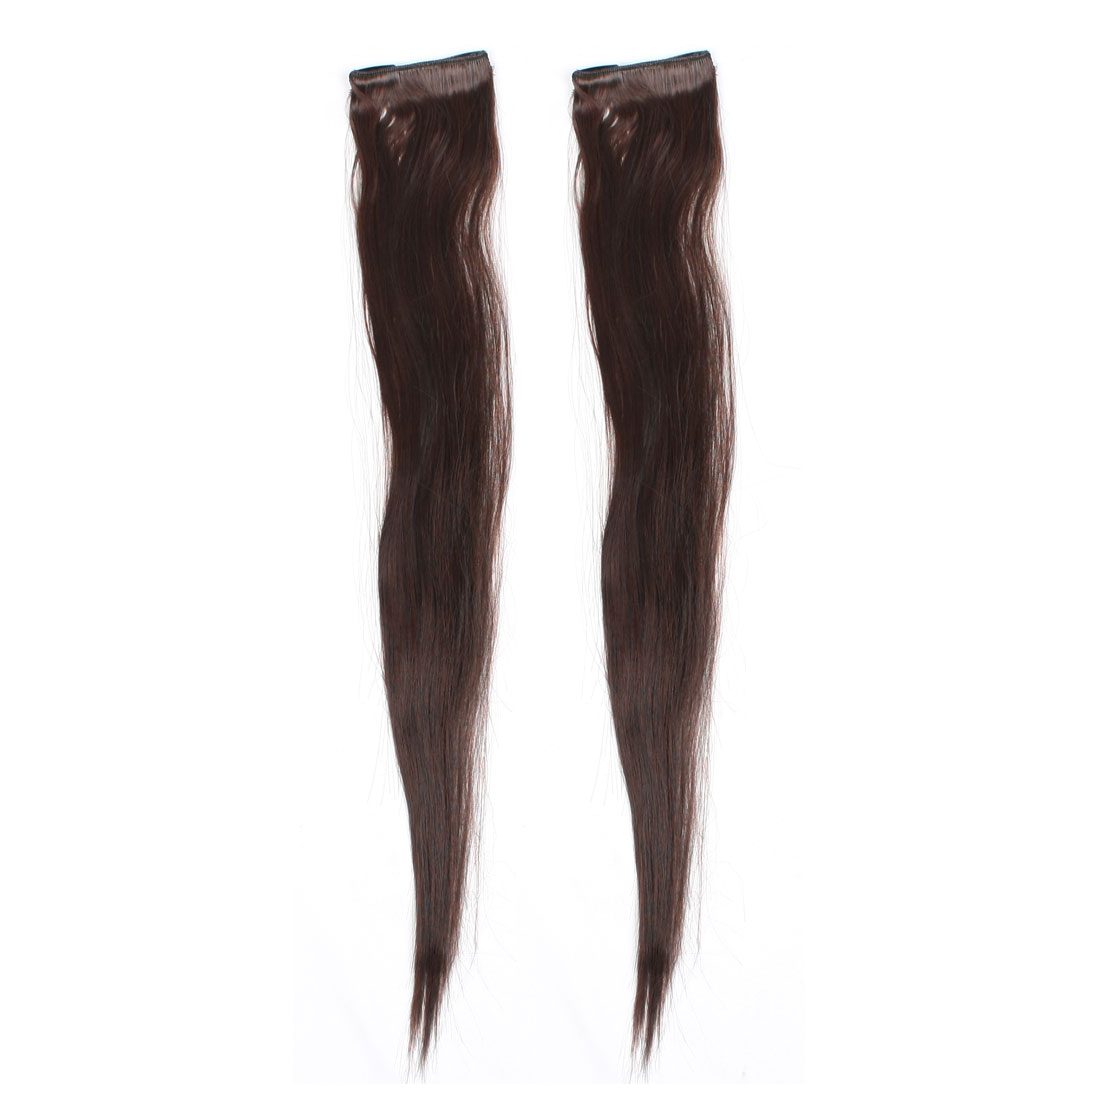 "Women Chestnut Colour Long Straight Ponytail Hairpiece 30"" 2 Pcs"